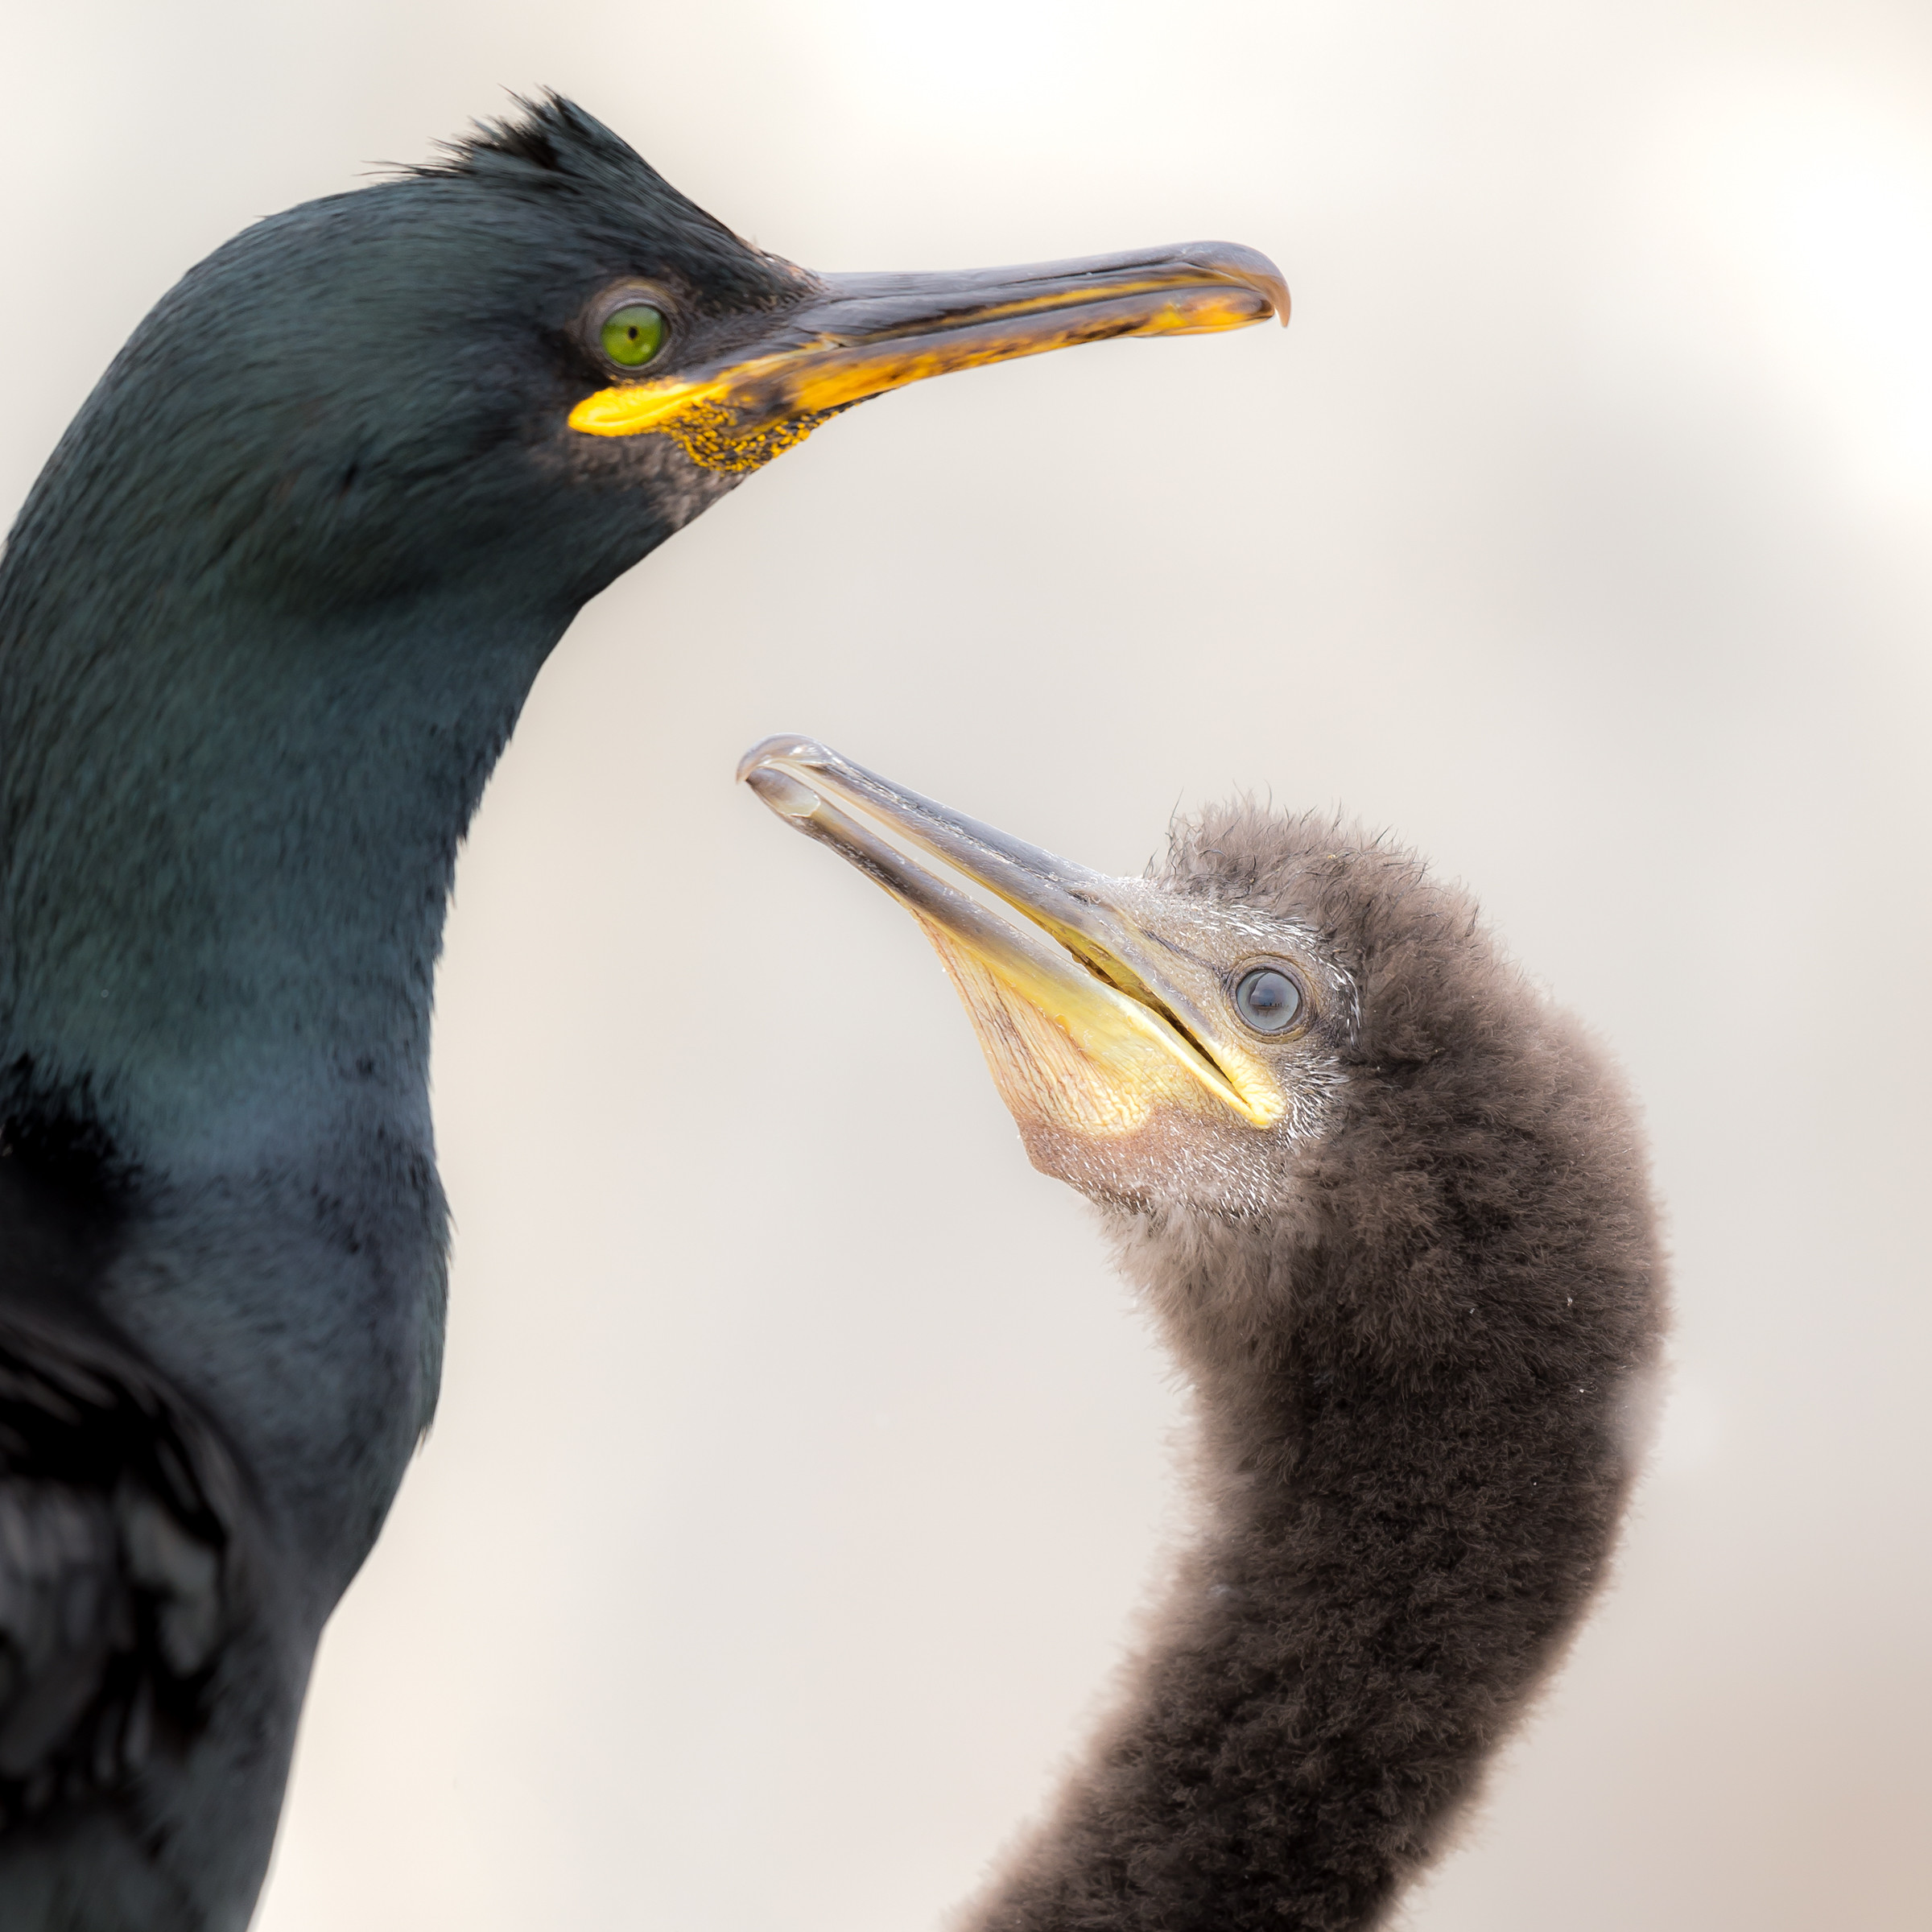 vogels BDZ aalscholver 1601